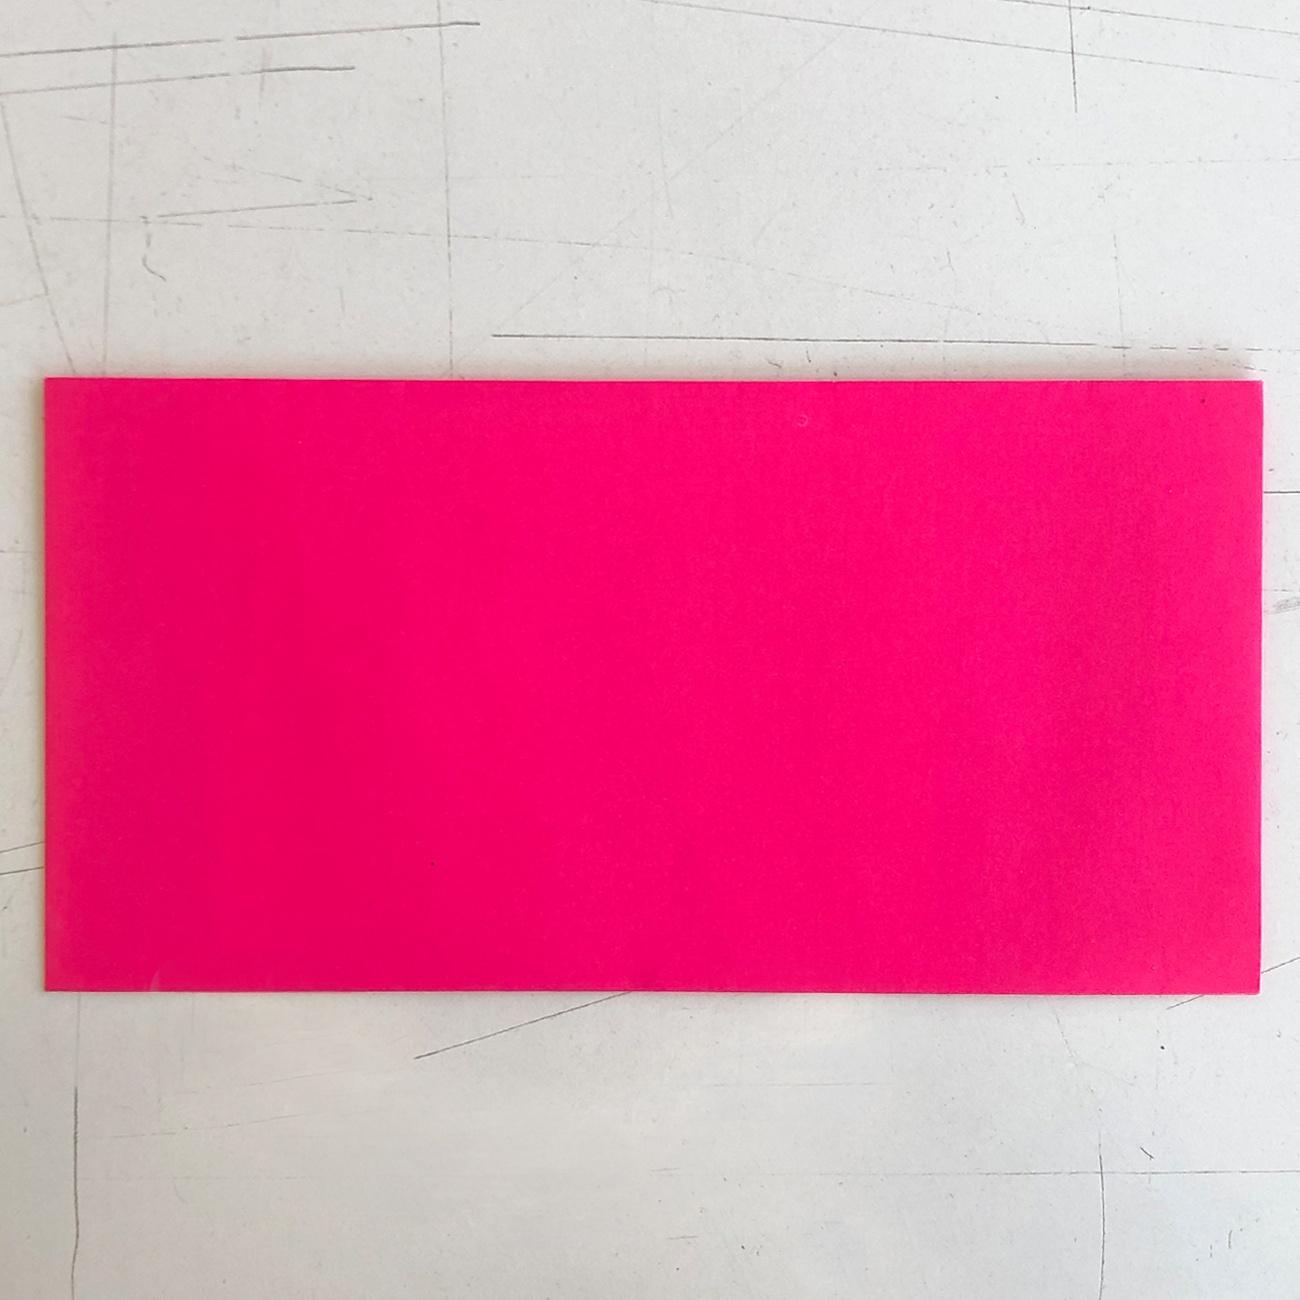 Neonkuvert, neonpink, din lang, selbstklebender Verschluss,